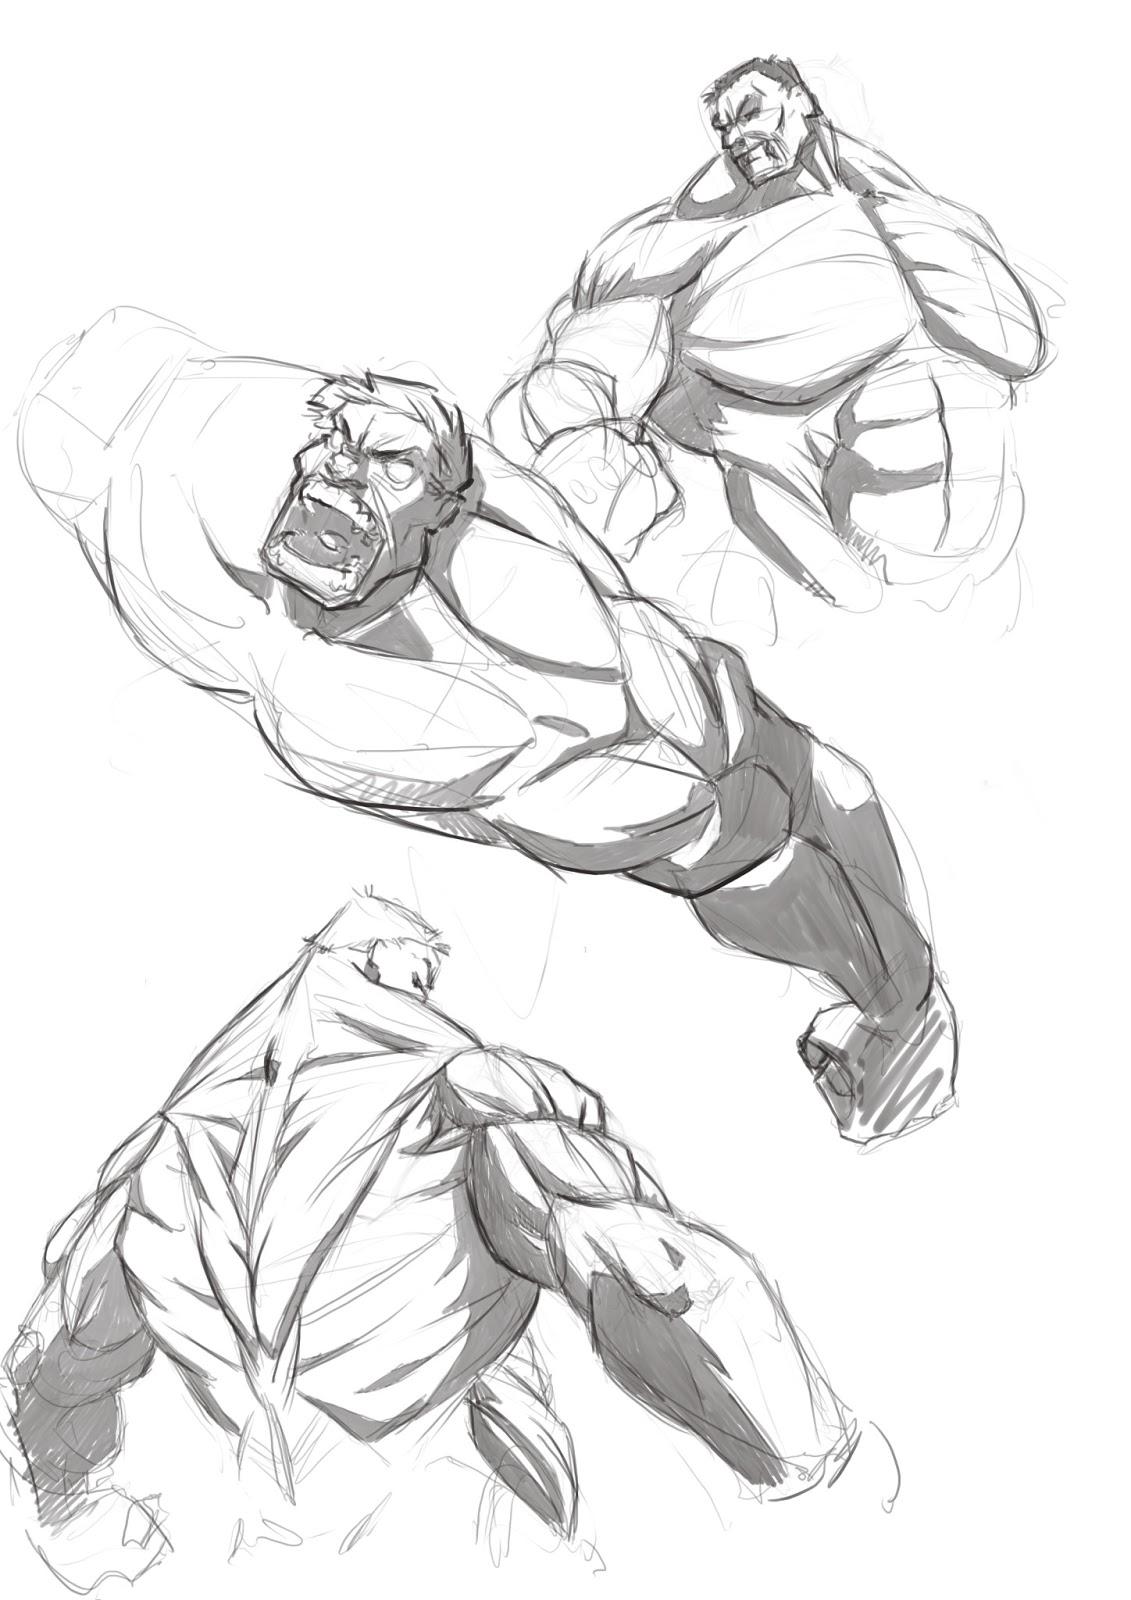 Art of Mark Sypesteyn: Hulk Sketches